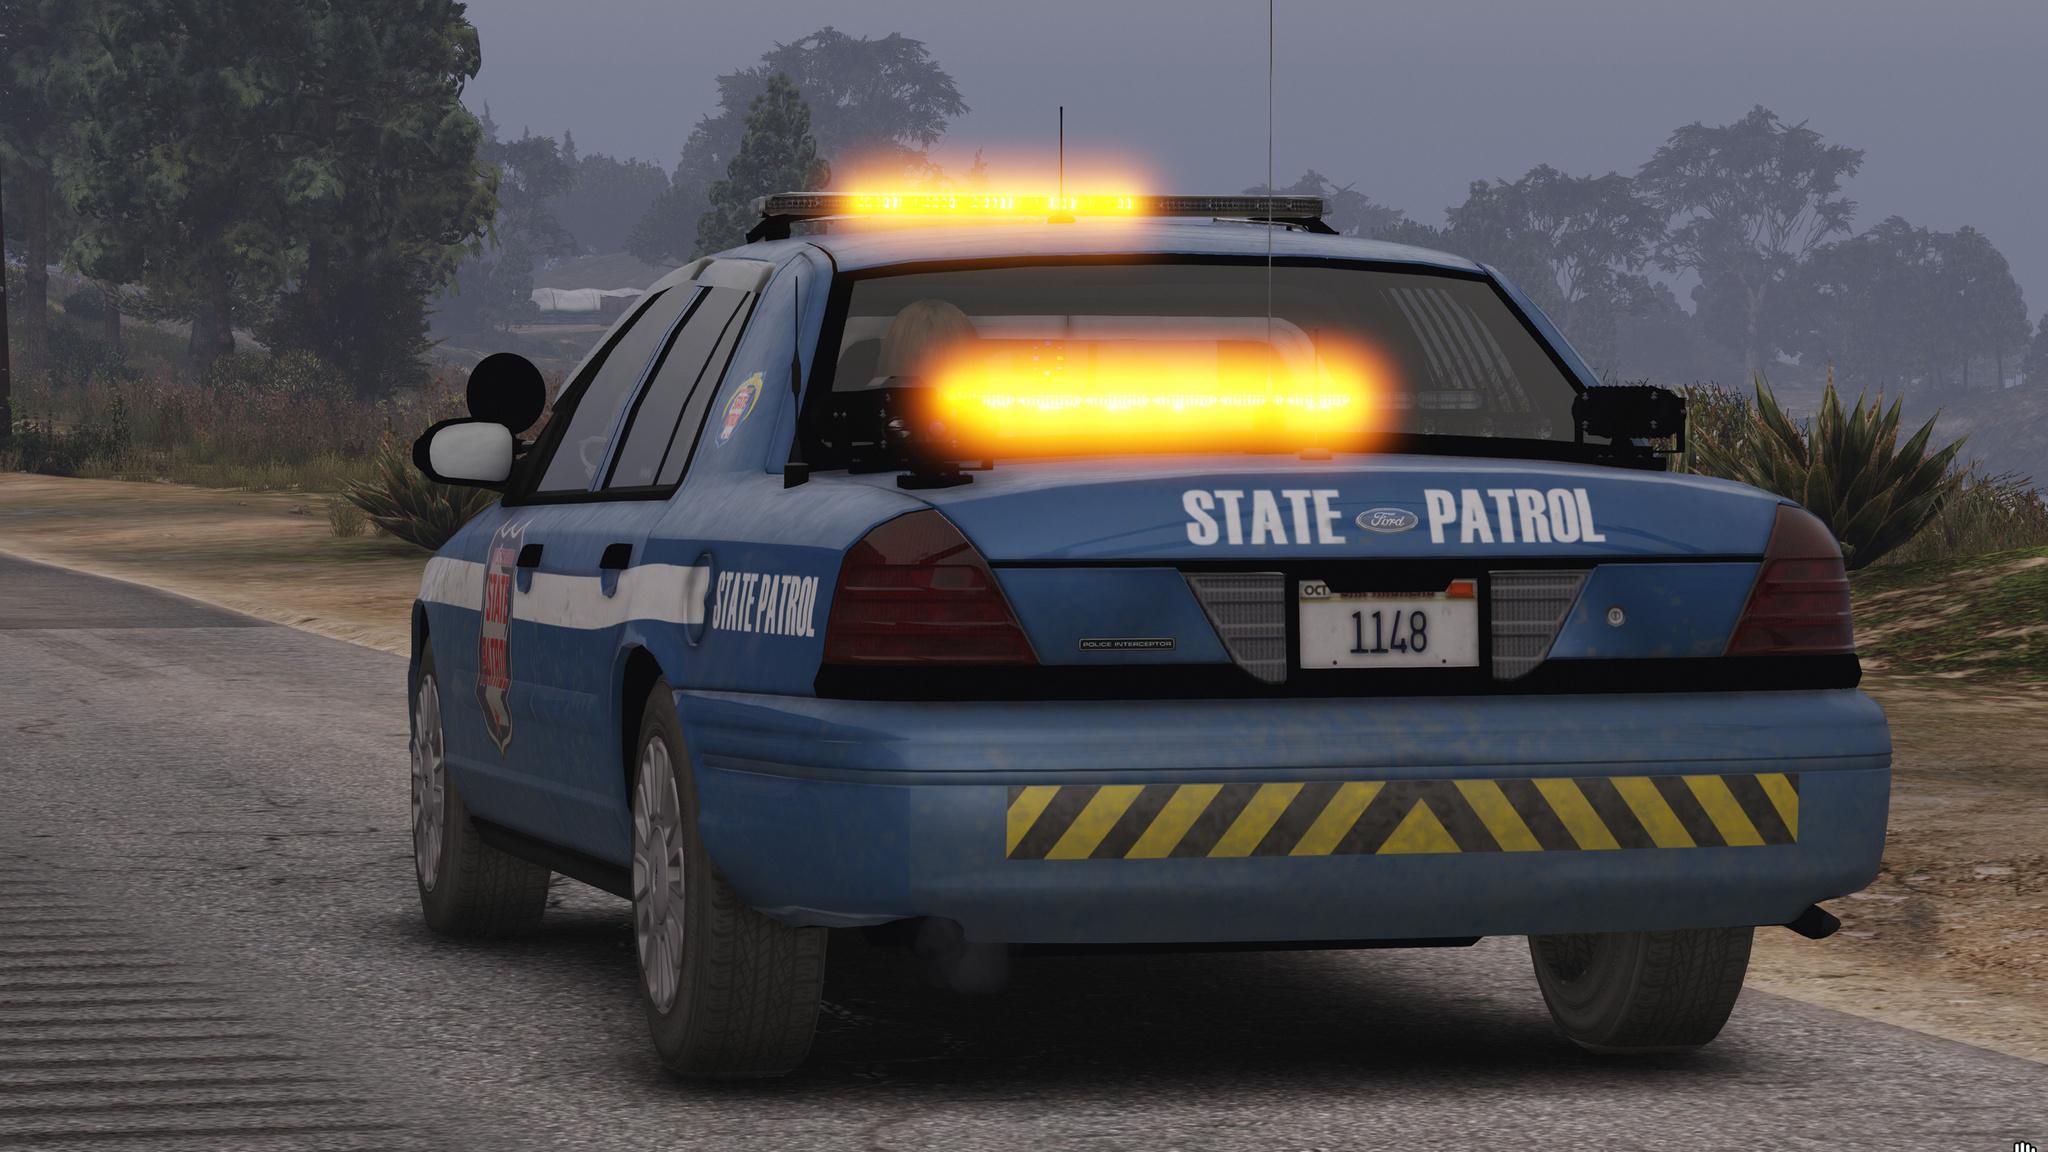 Wisconsin State Patrol 2011 Cvpi  Crown Victoria